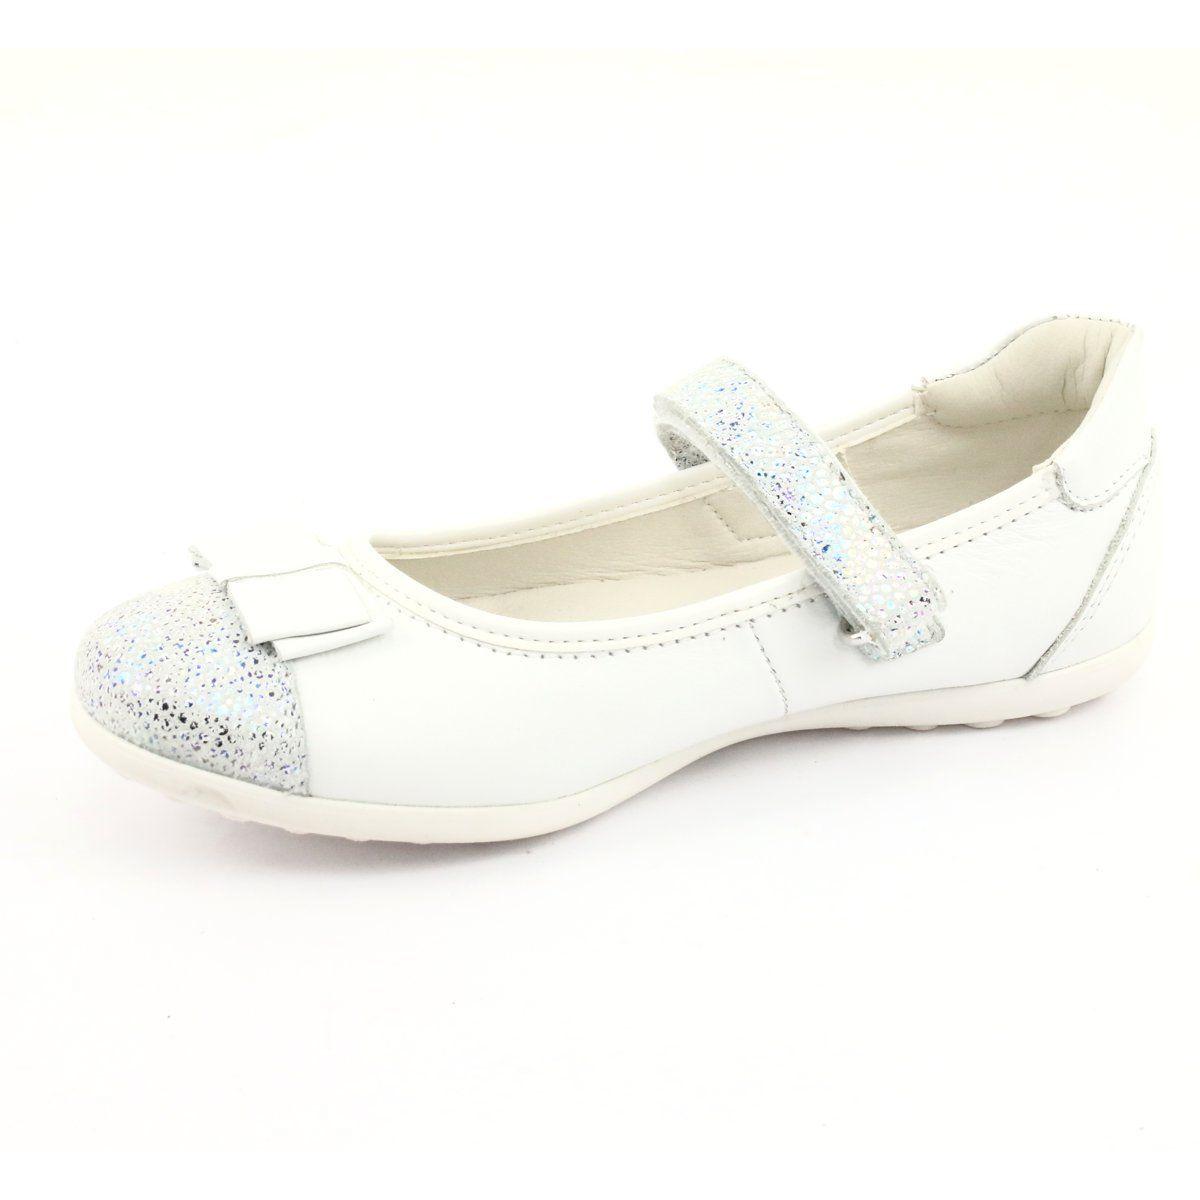 Befado Buty Dzieciece Balerinki 170y019 Biale Childrens Shoes Girls Pumps Girls Shoes